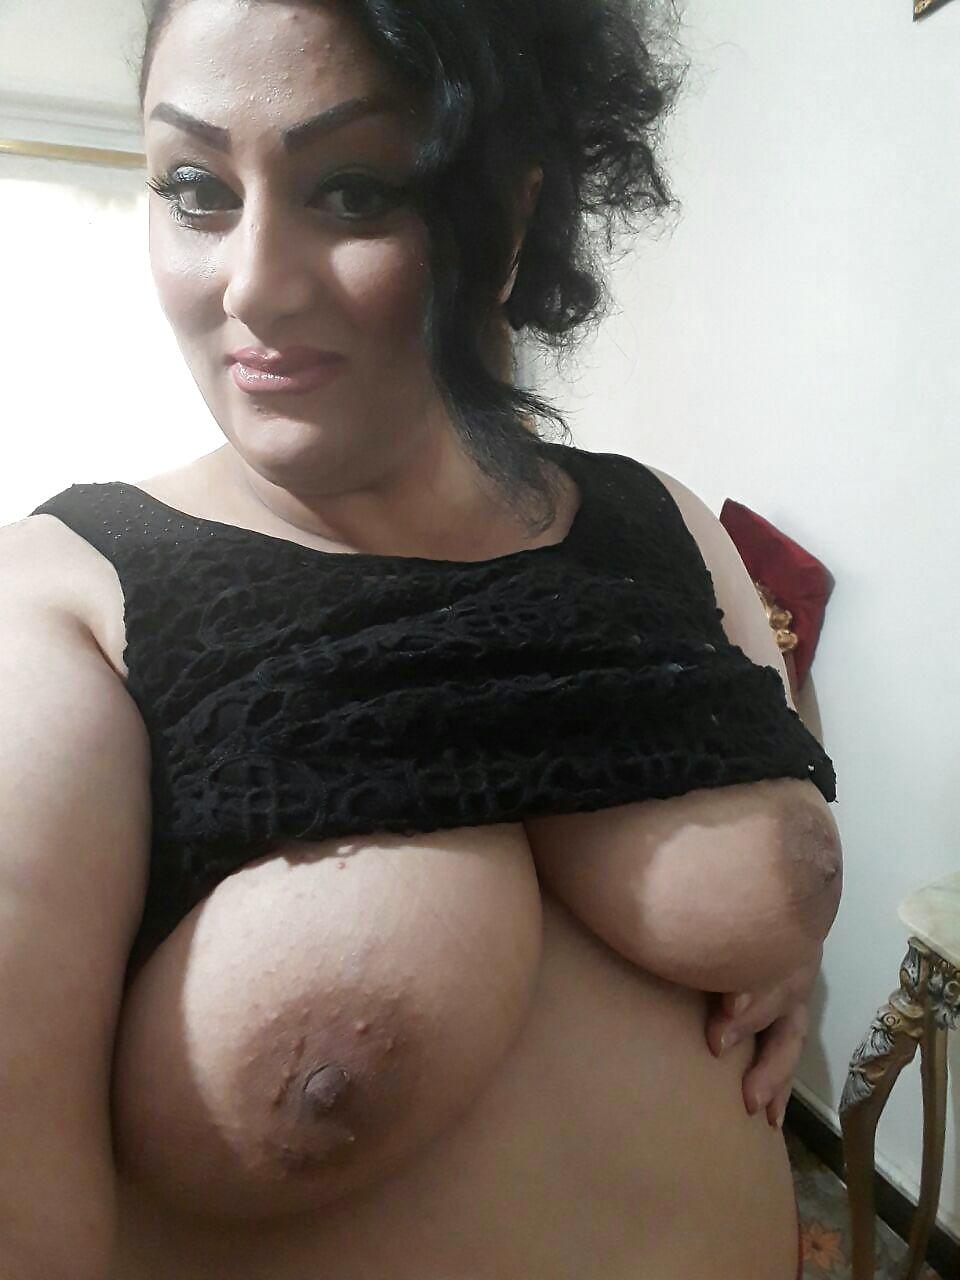 Sexy persian big tits, hot bali girls photos sex